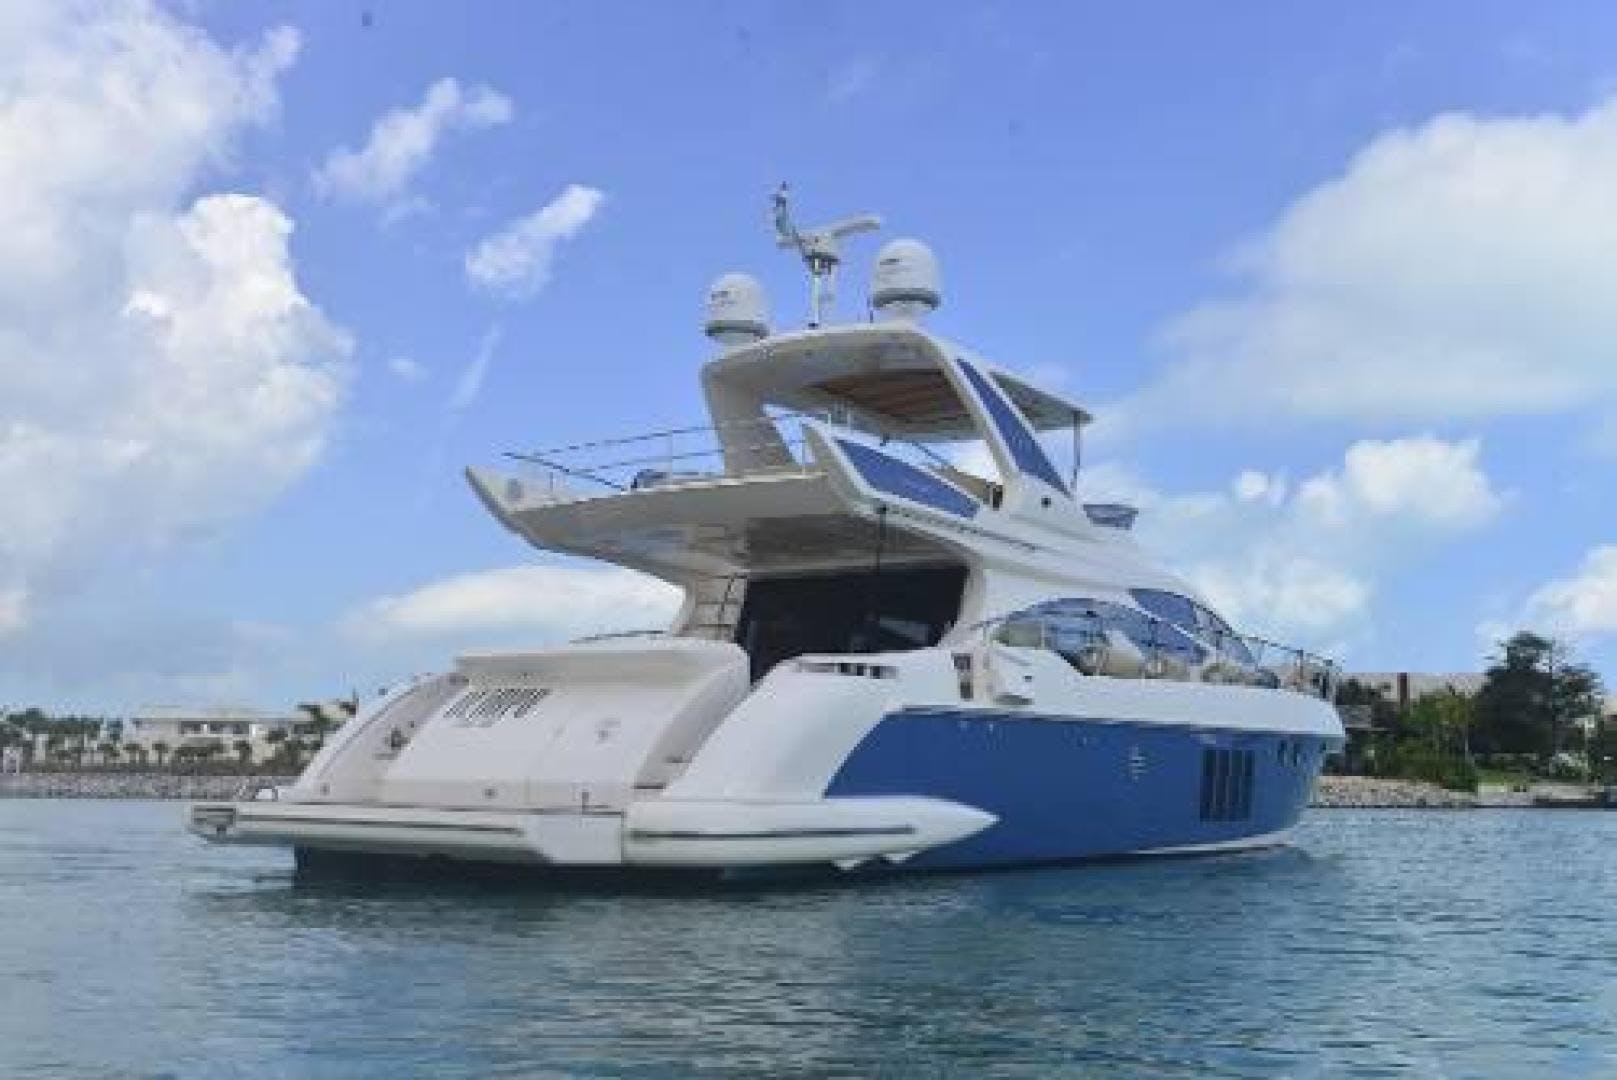 2012 Azimut 64' Flybridge Motor Yacht  | Picture 4 of 15